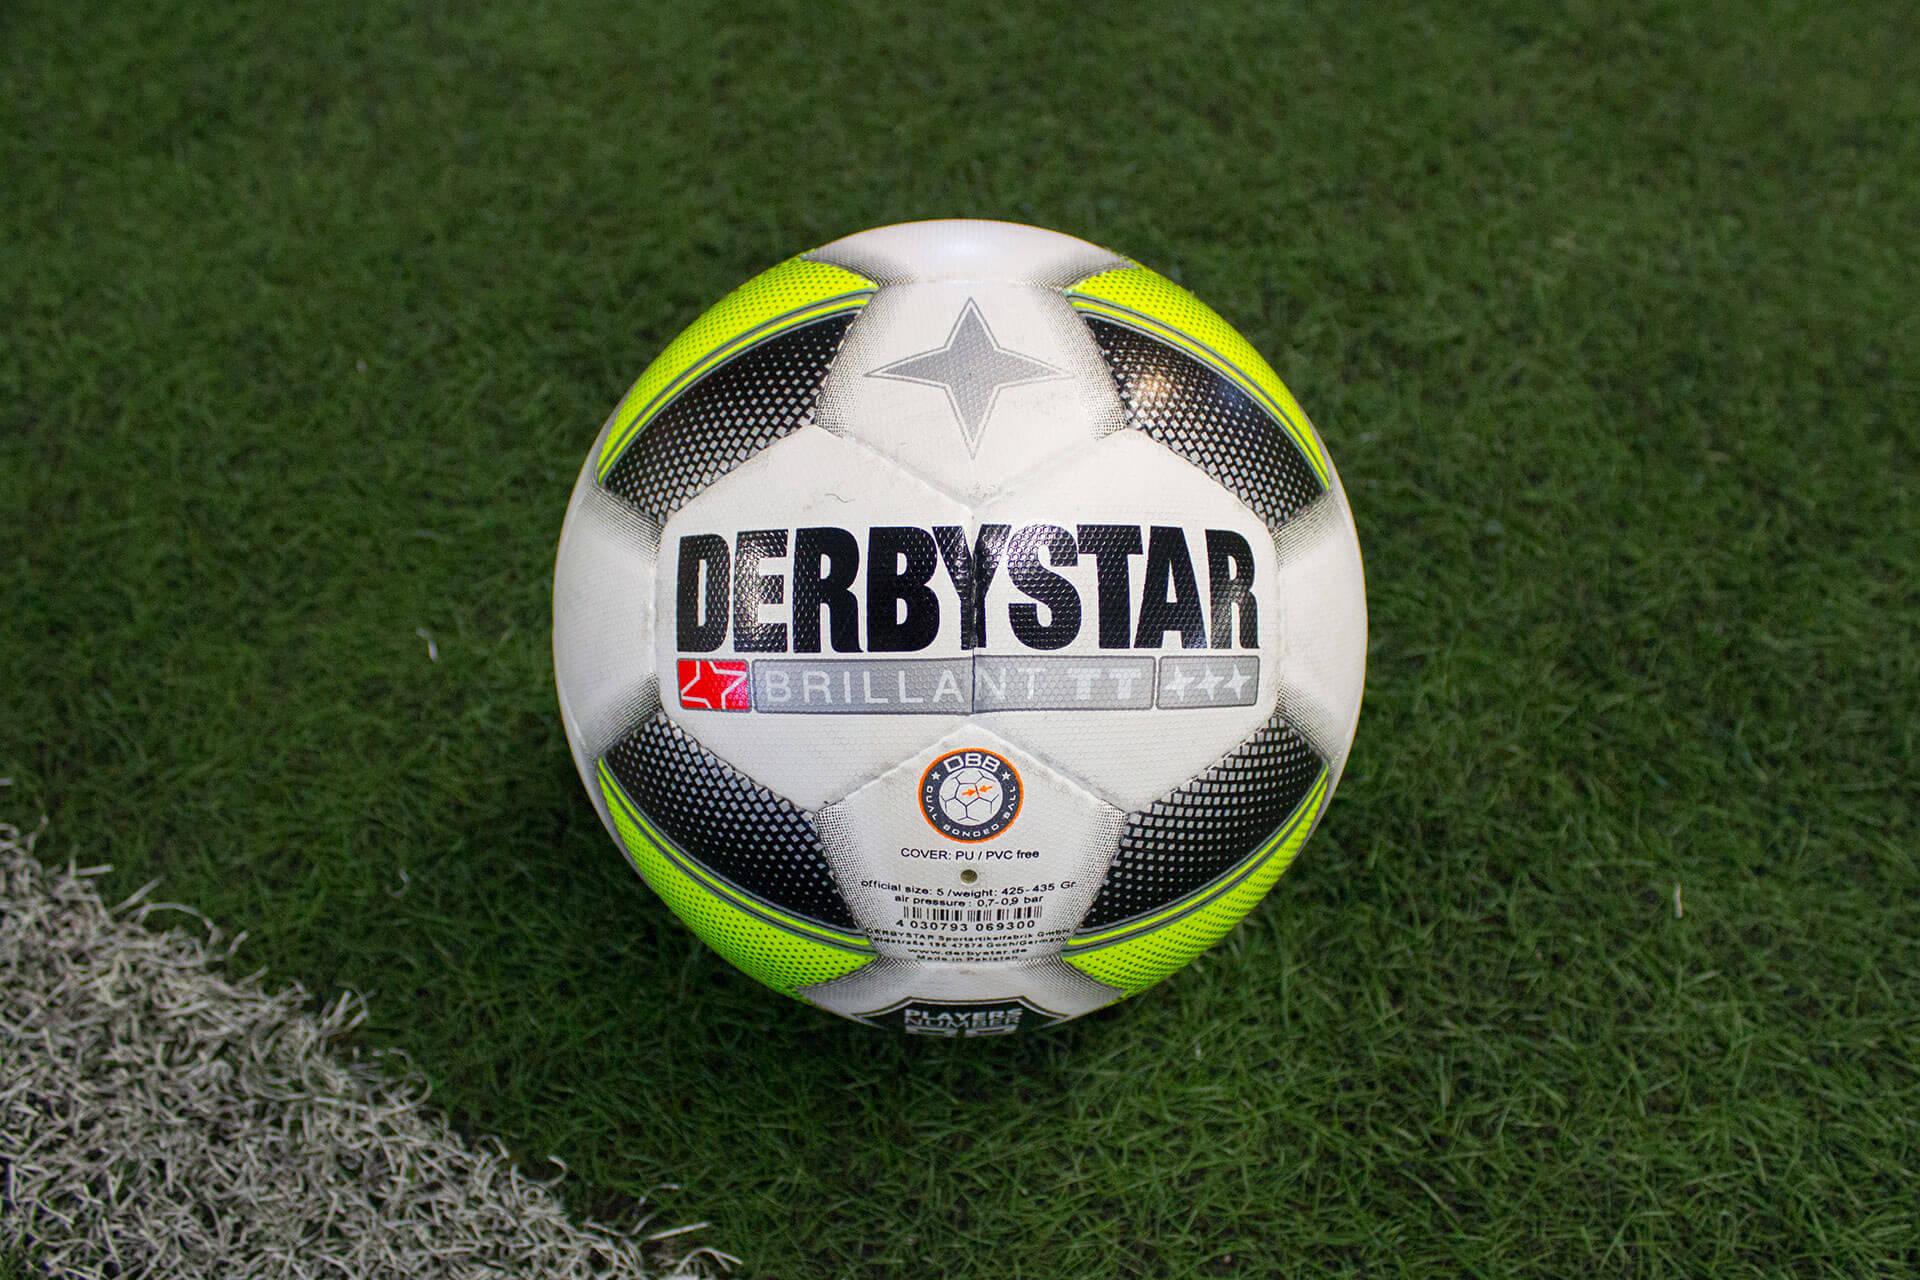 Derbystar Brillant TT DBB+